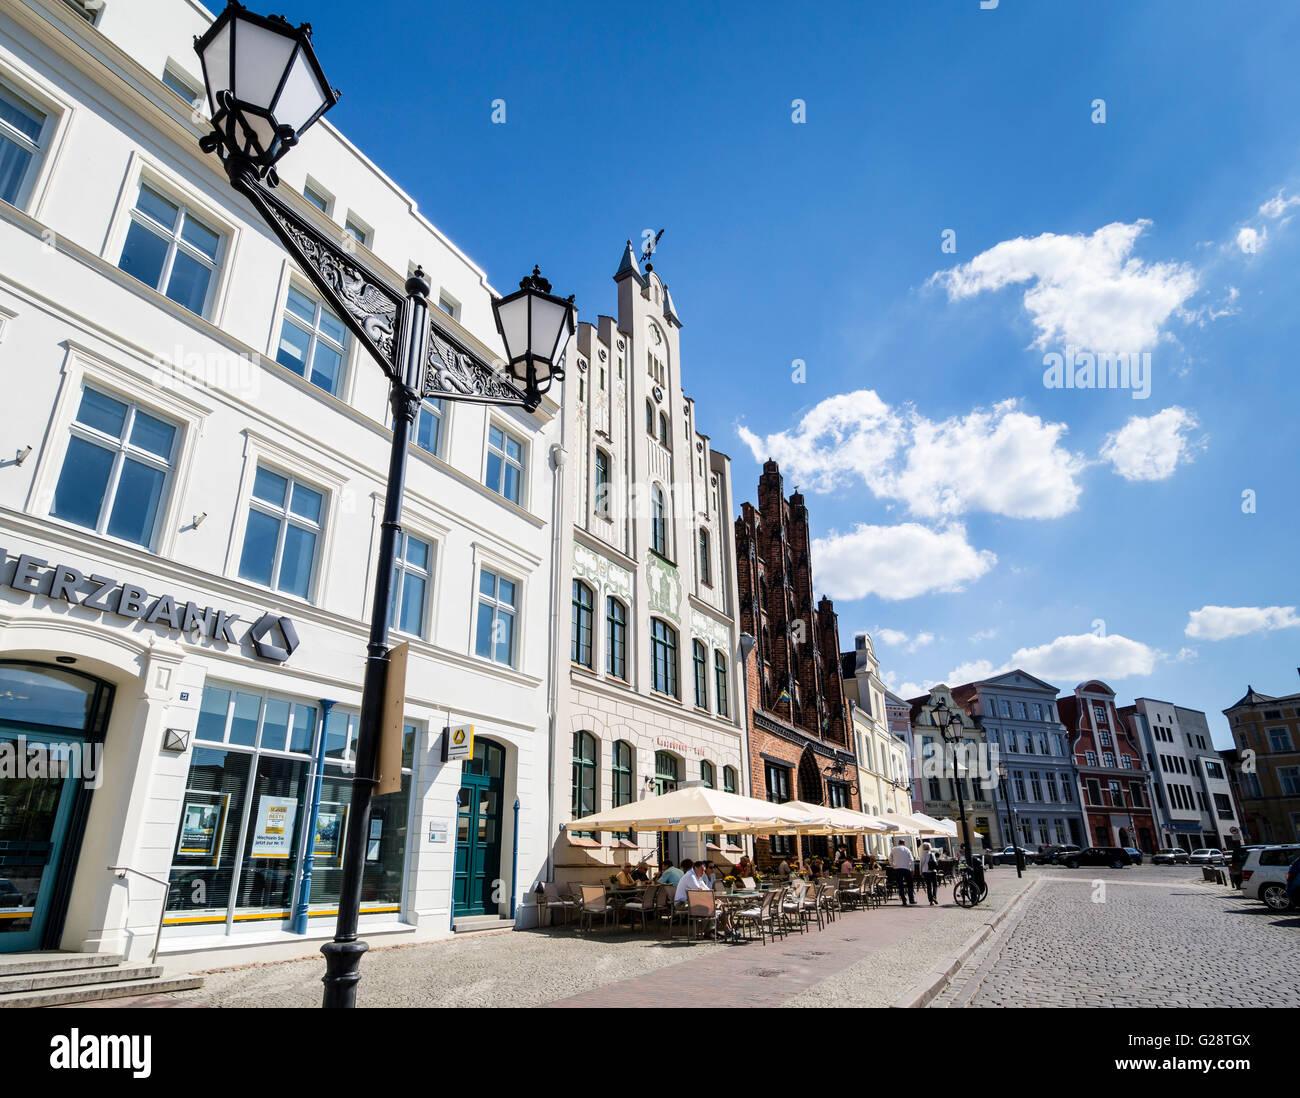 'Wasserkunst', water well, Historic downtown, marktplatz, market place, town square,  Wismar, Germany. - Stock Image